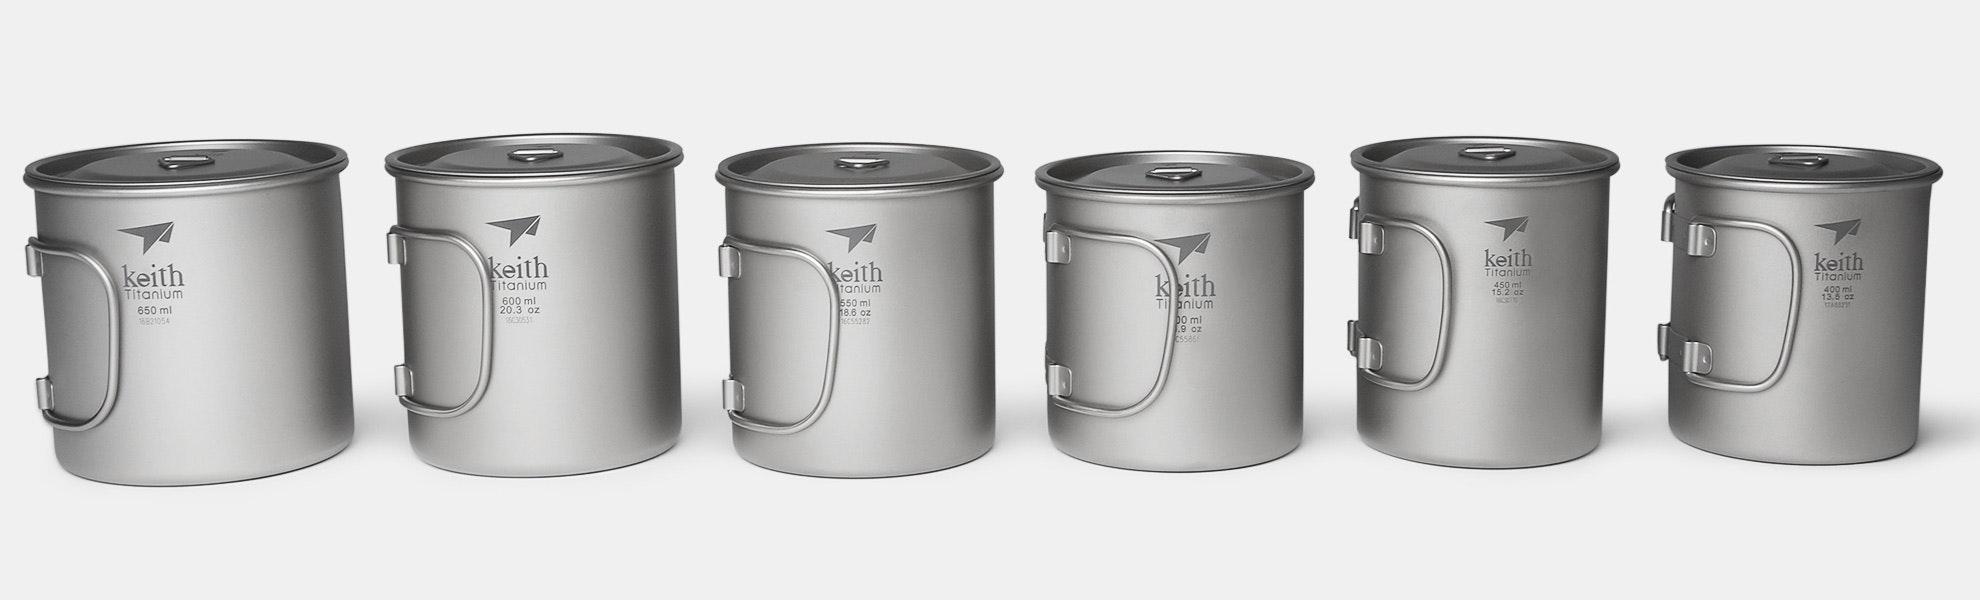 Keith Titanium Single-Wall Mugs